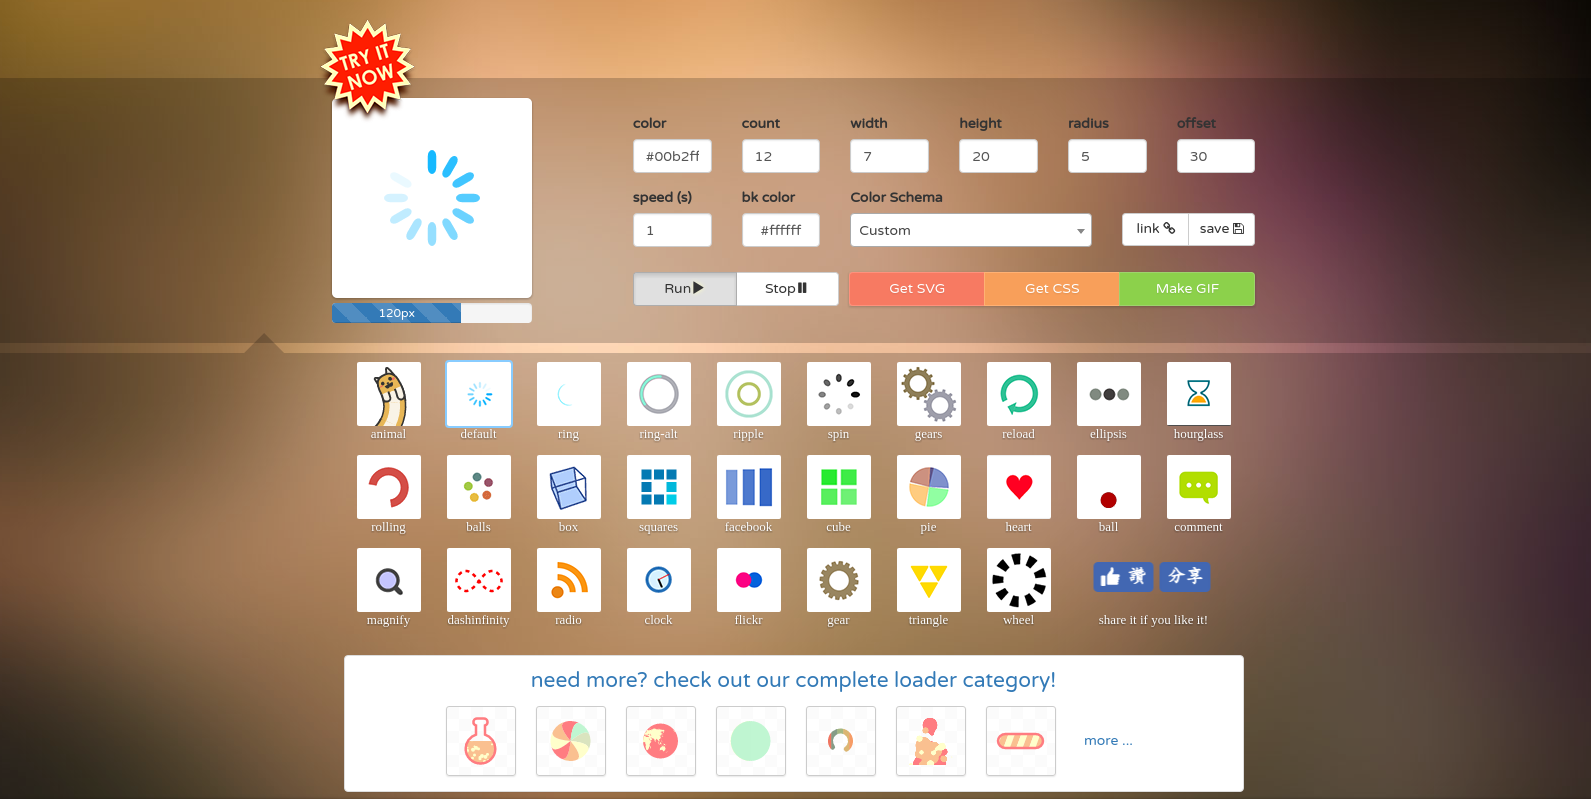 還在找 Loading 素材嗎? loading.io 快速產生客製化 Loading 素材,支援 GIF、CSS 、SVG